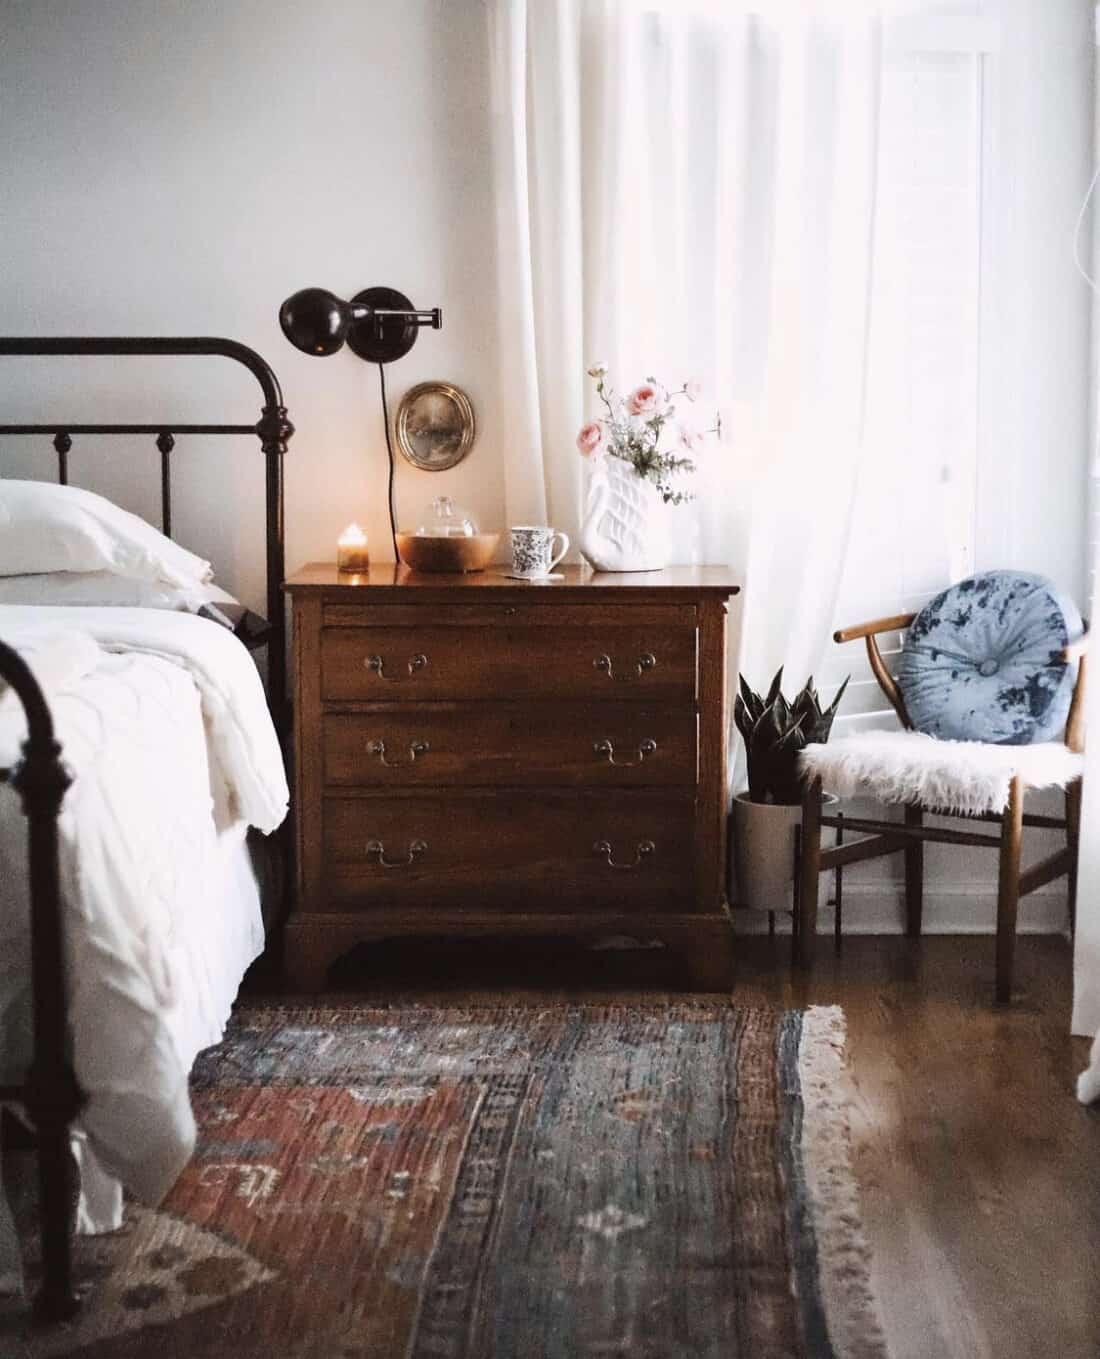 vintage style rug in a master bedroom